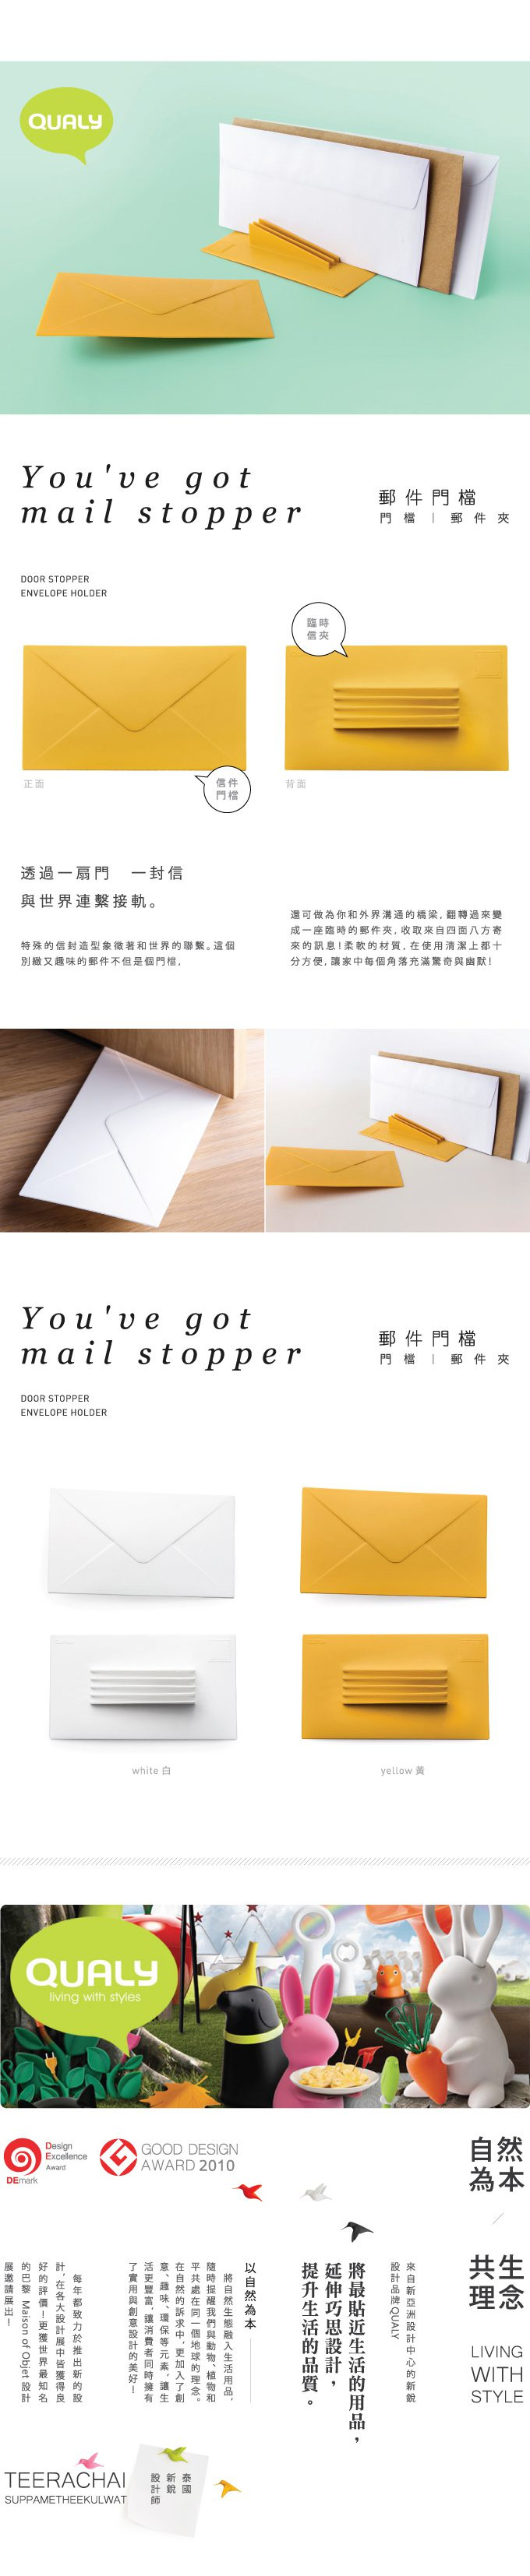 【FINAL CALL】QUALY 郵件門檔(白)